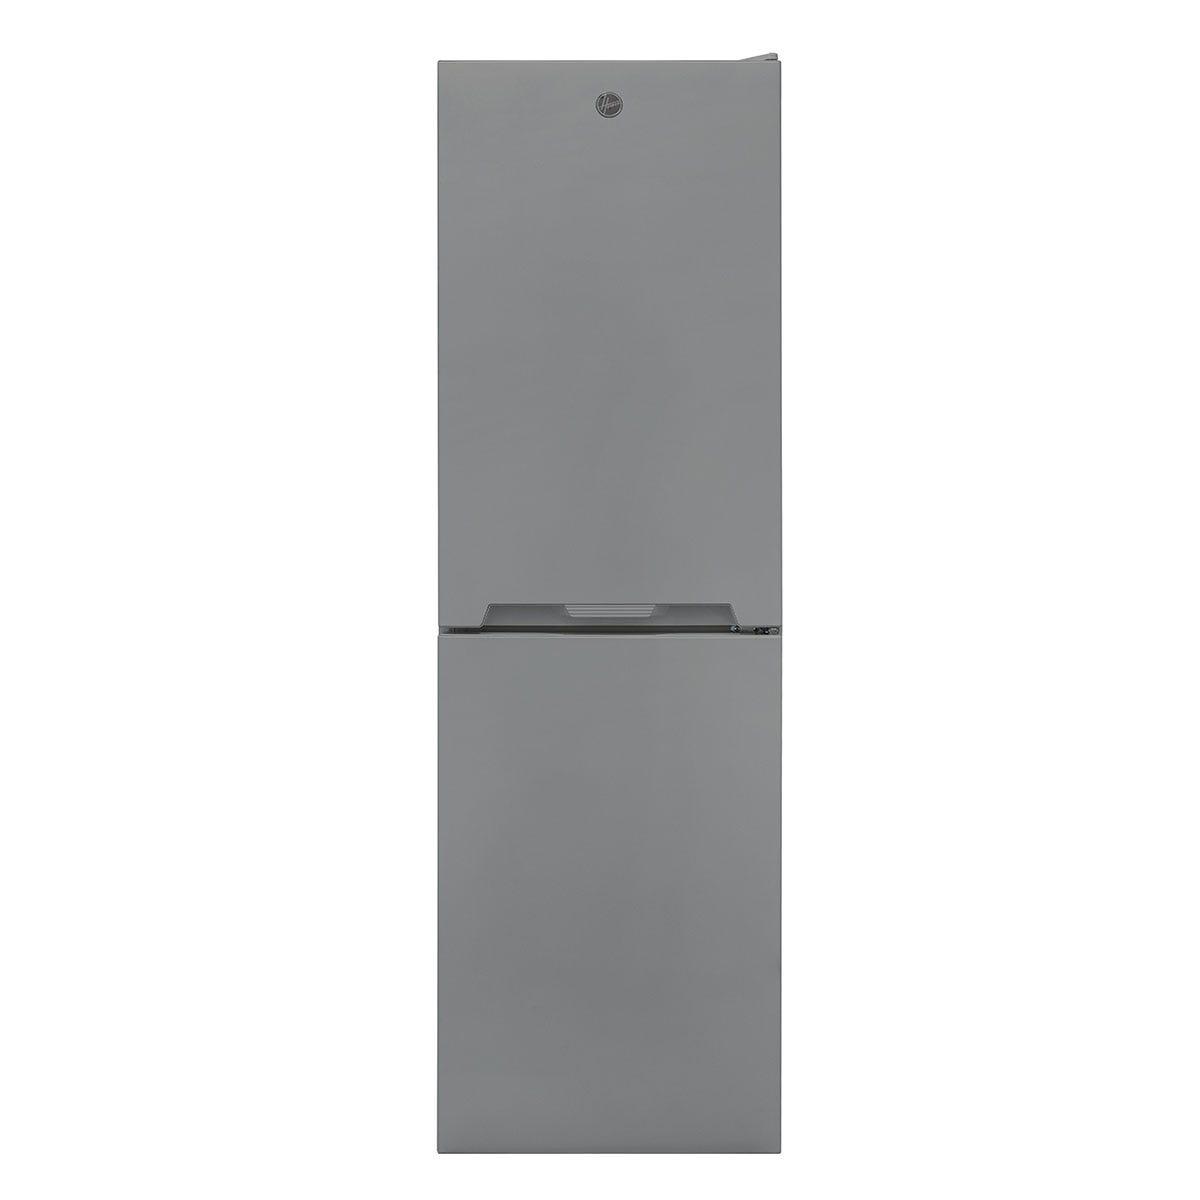 Hoover HOCV1S517FXK 163L/114L Freestanding Static Fridge Freezer - Grey